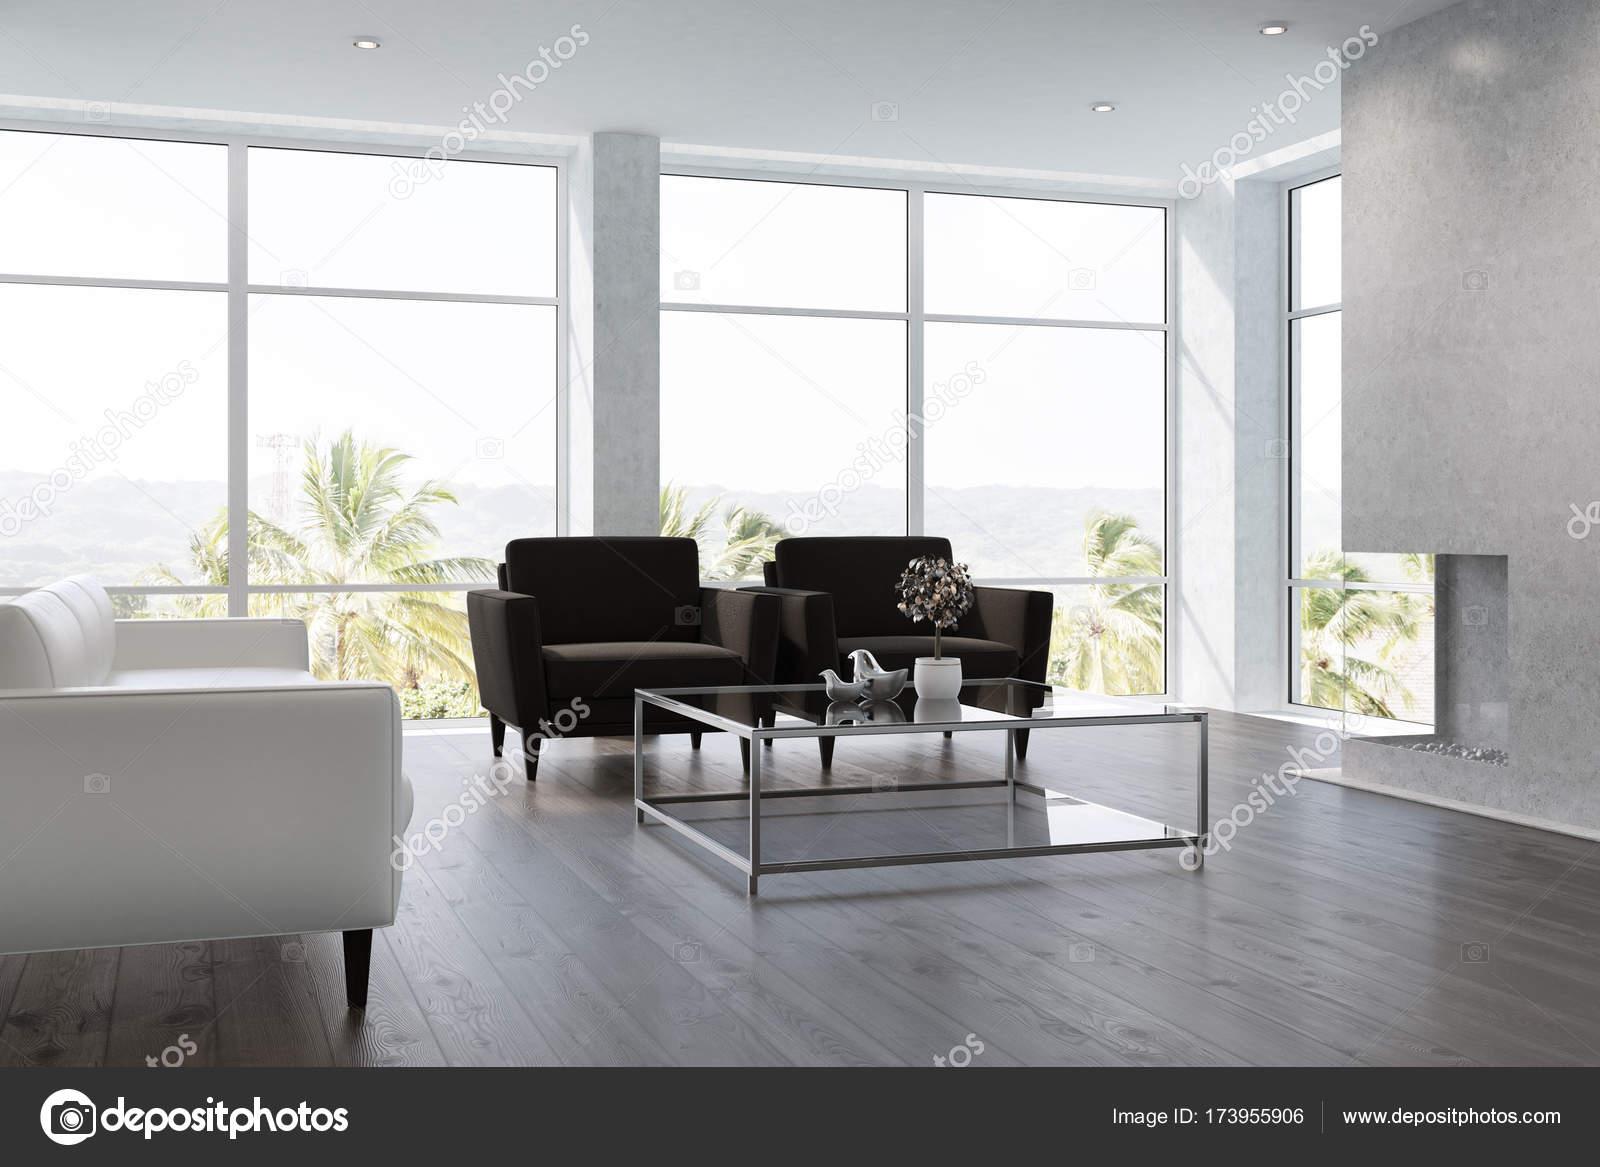 Wit woonkamer interieur zwart fauteuils u stockfoto